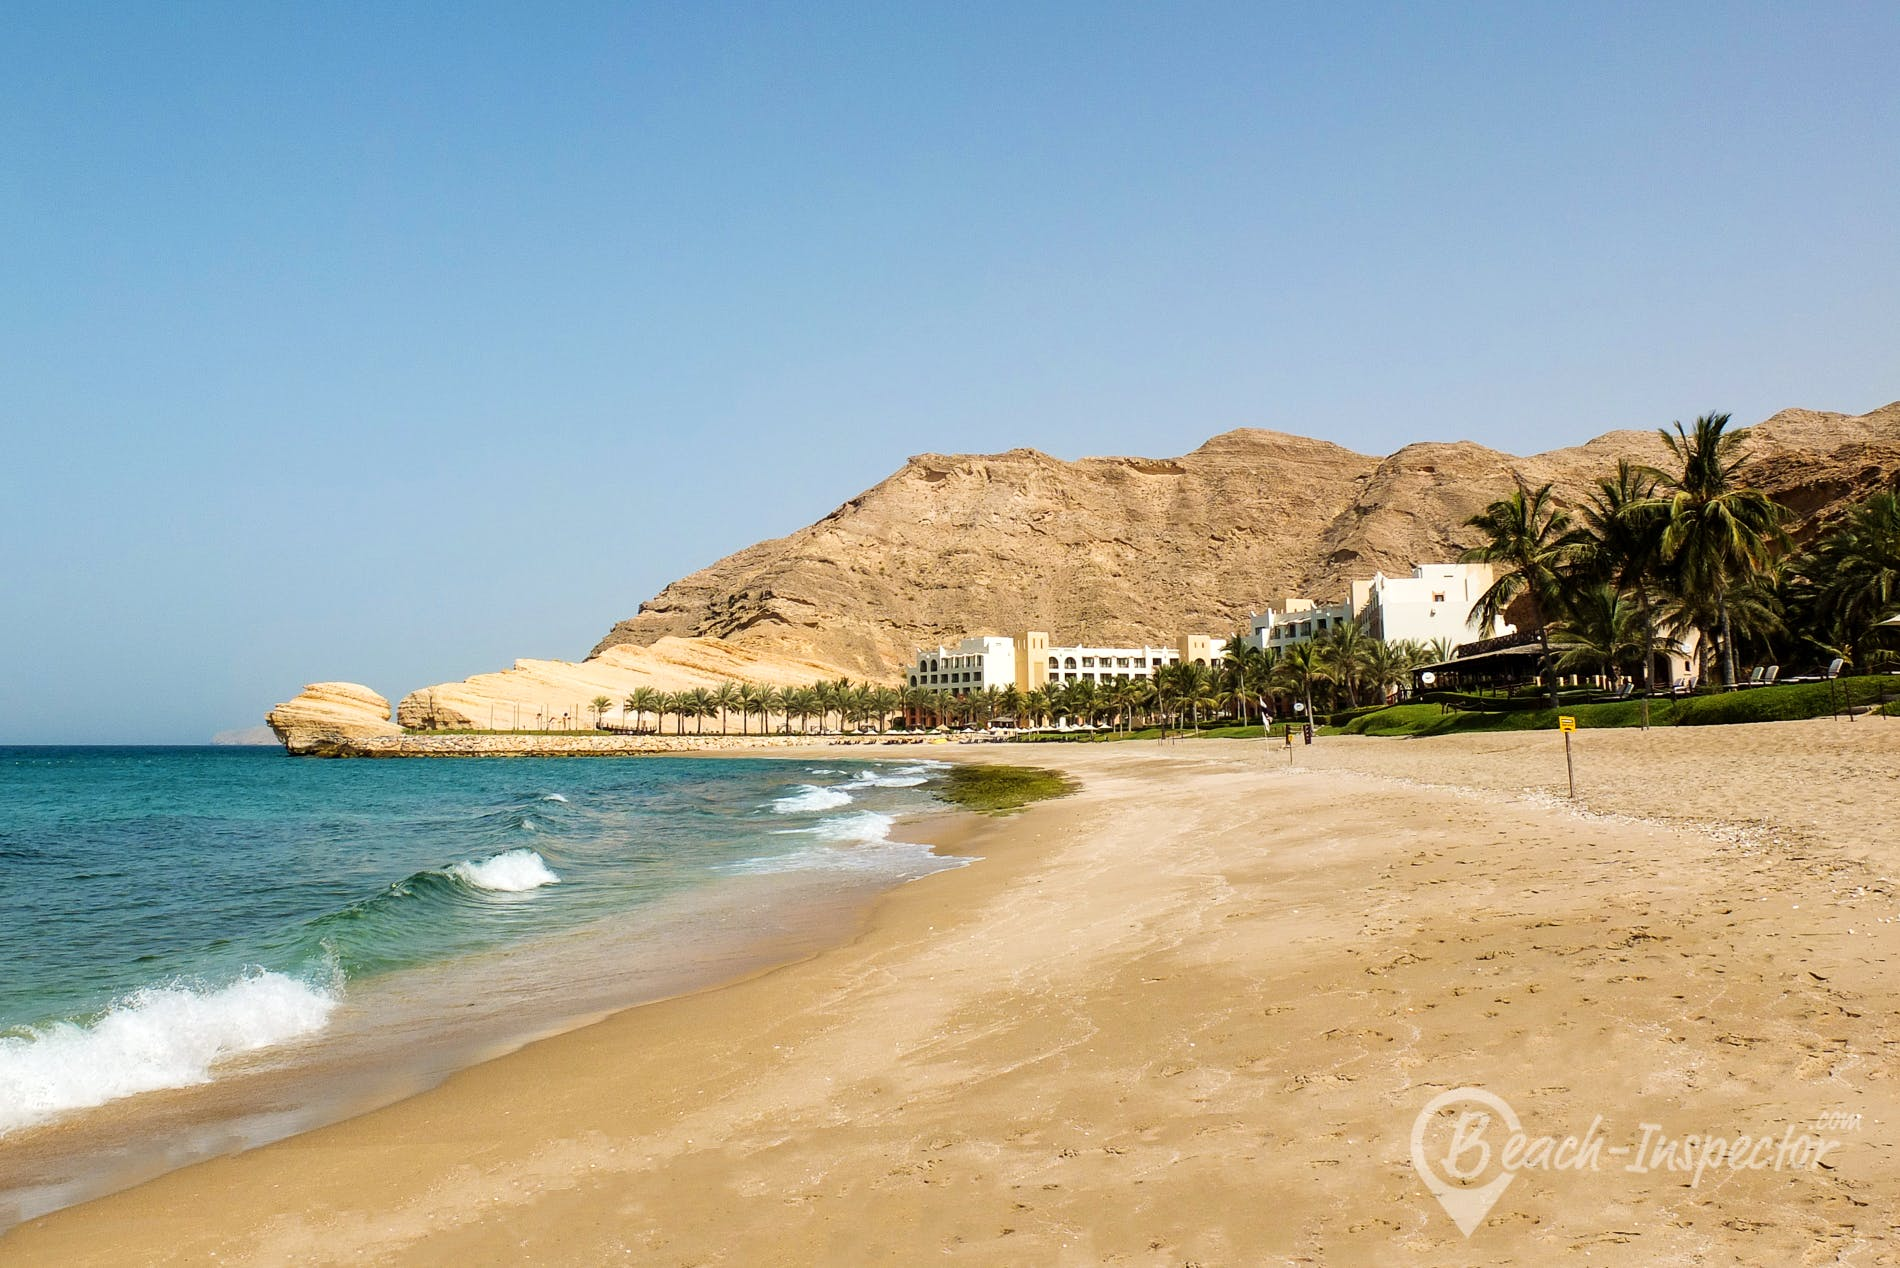 Beach Al Jissah Beach, Oman, Oman